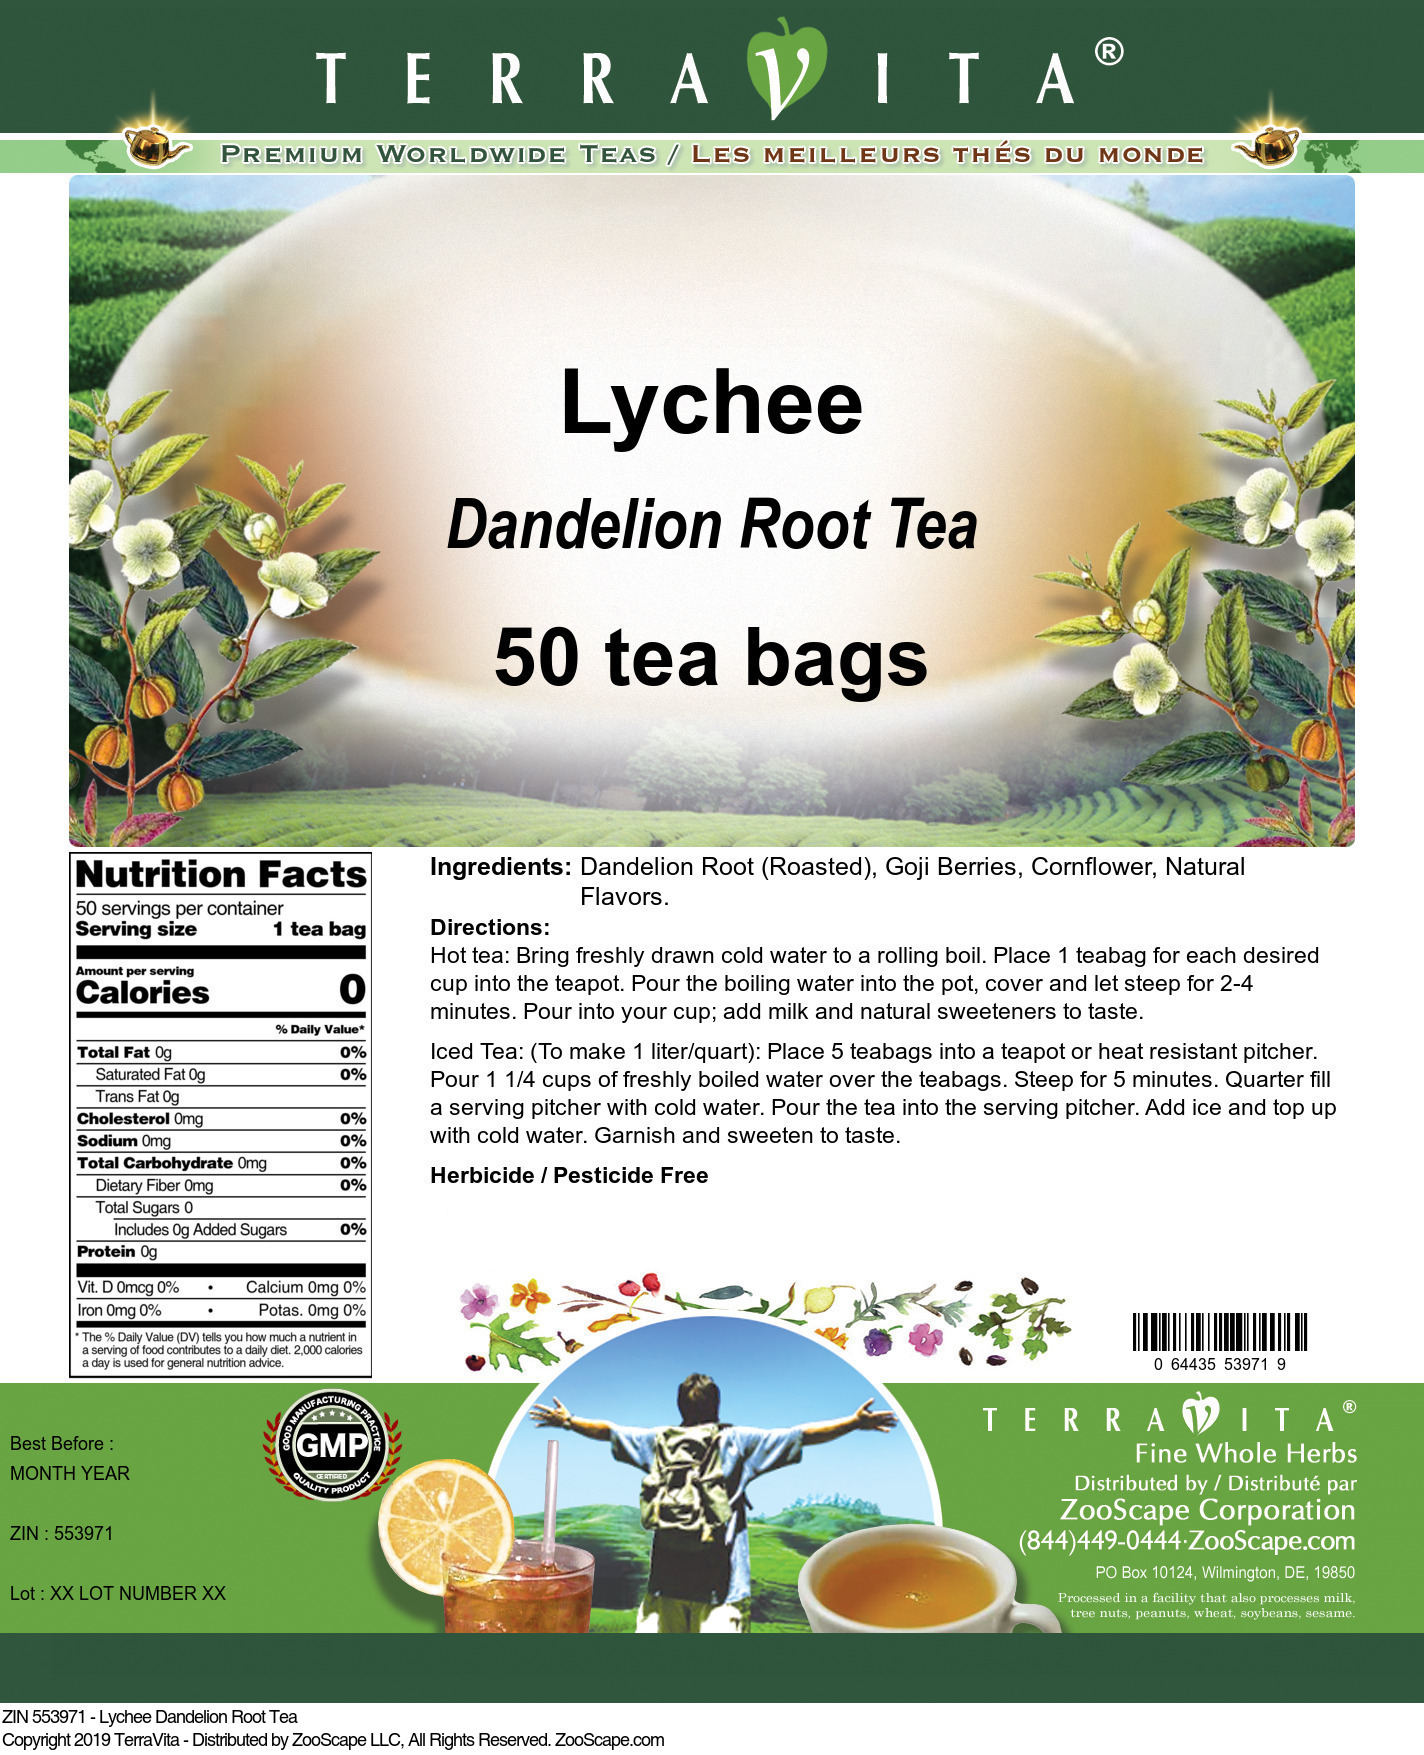 Lychee Dandelion Root